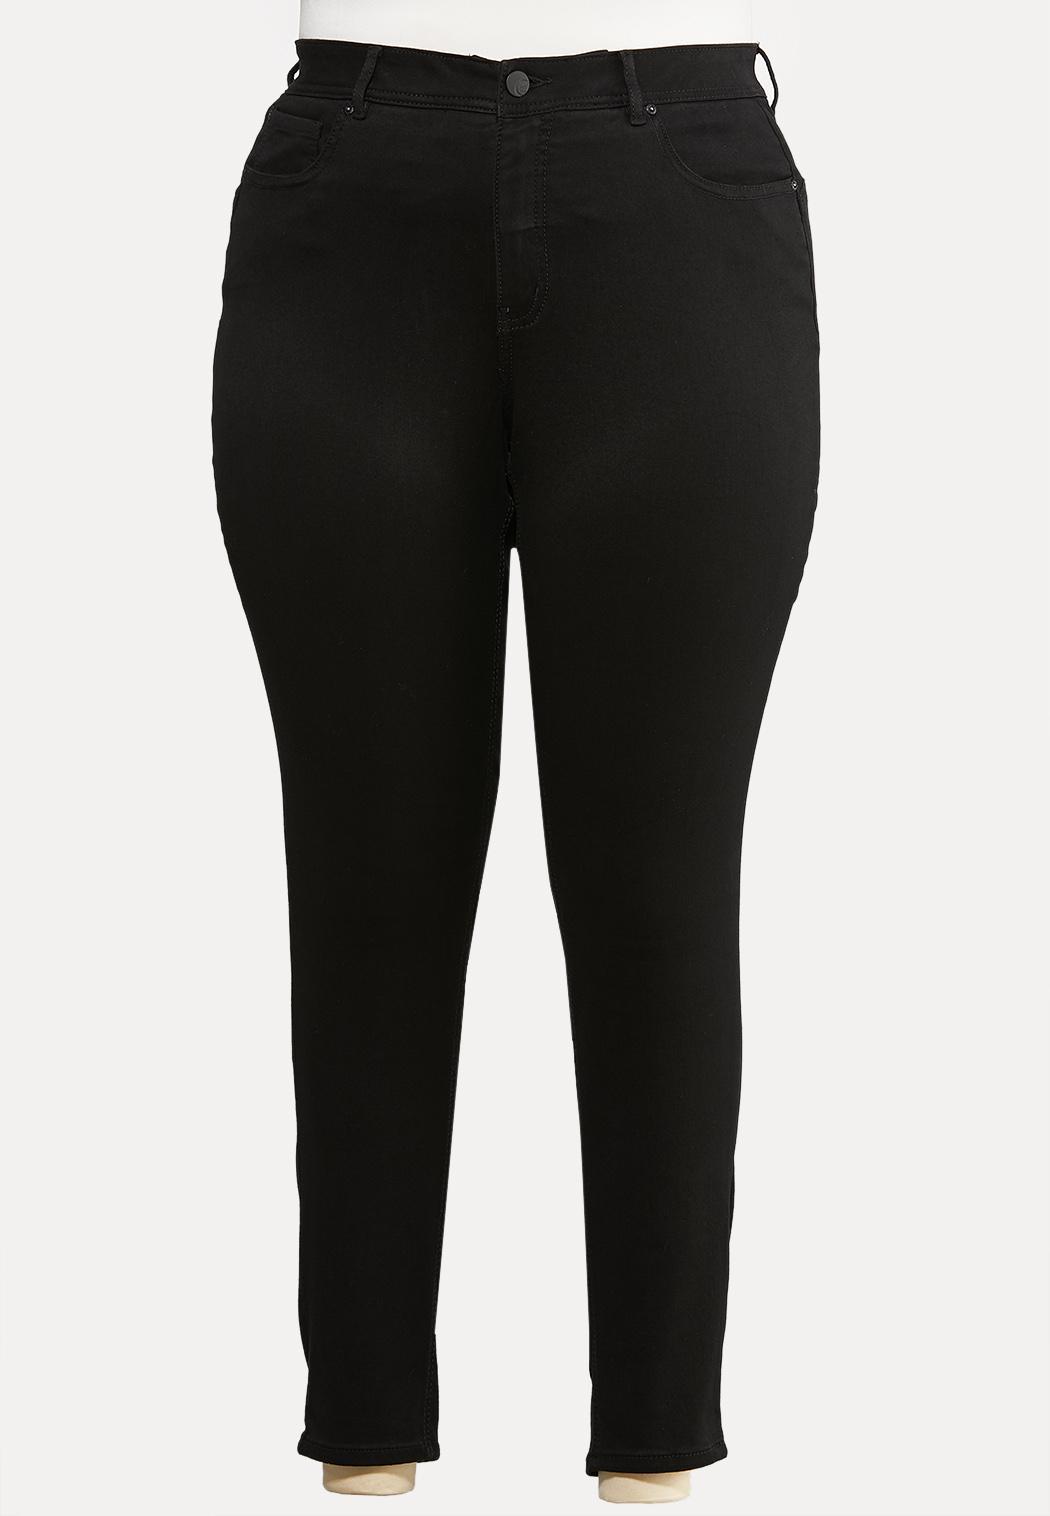 Plus Size The Perfect Black Jean